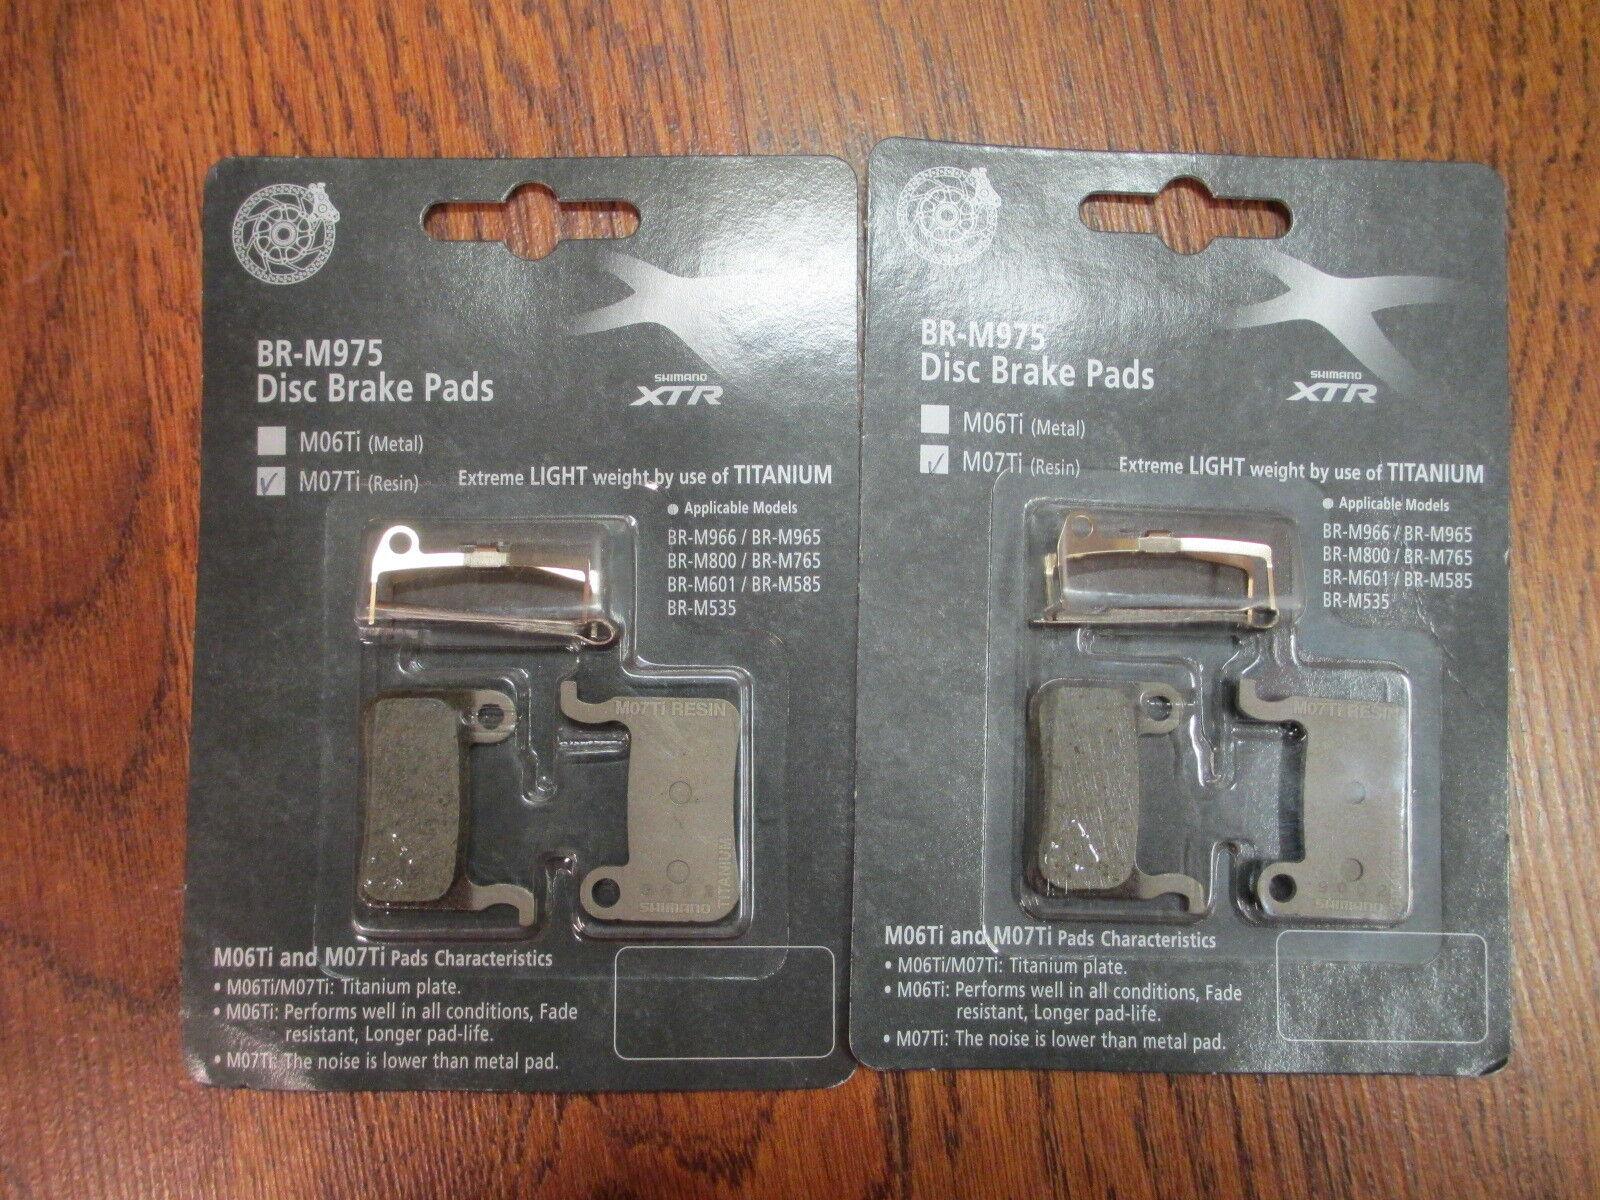 SHIMANO XTR  BR-M975 DISC BRAKE PADS TITANIUM MO7Ti ( RESIN ) SET (2)  quality assurance